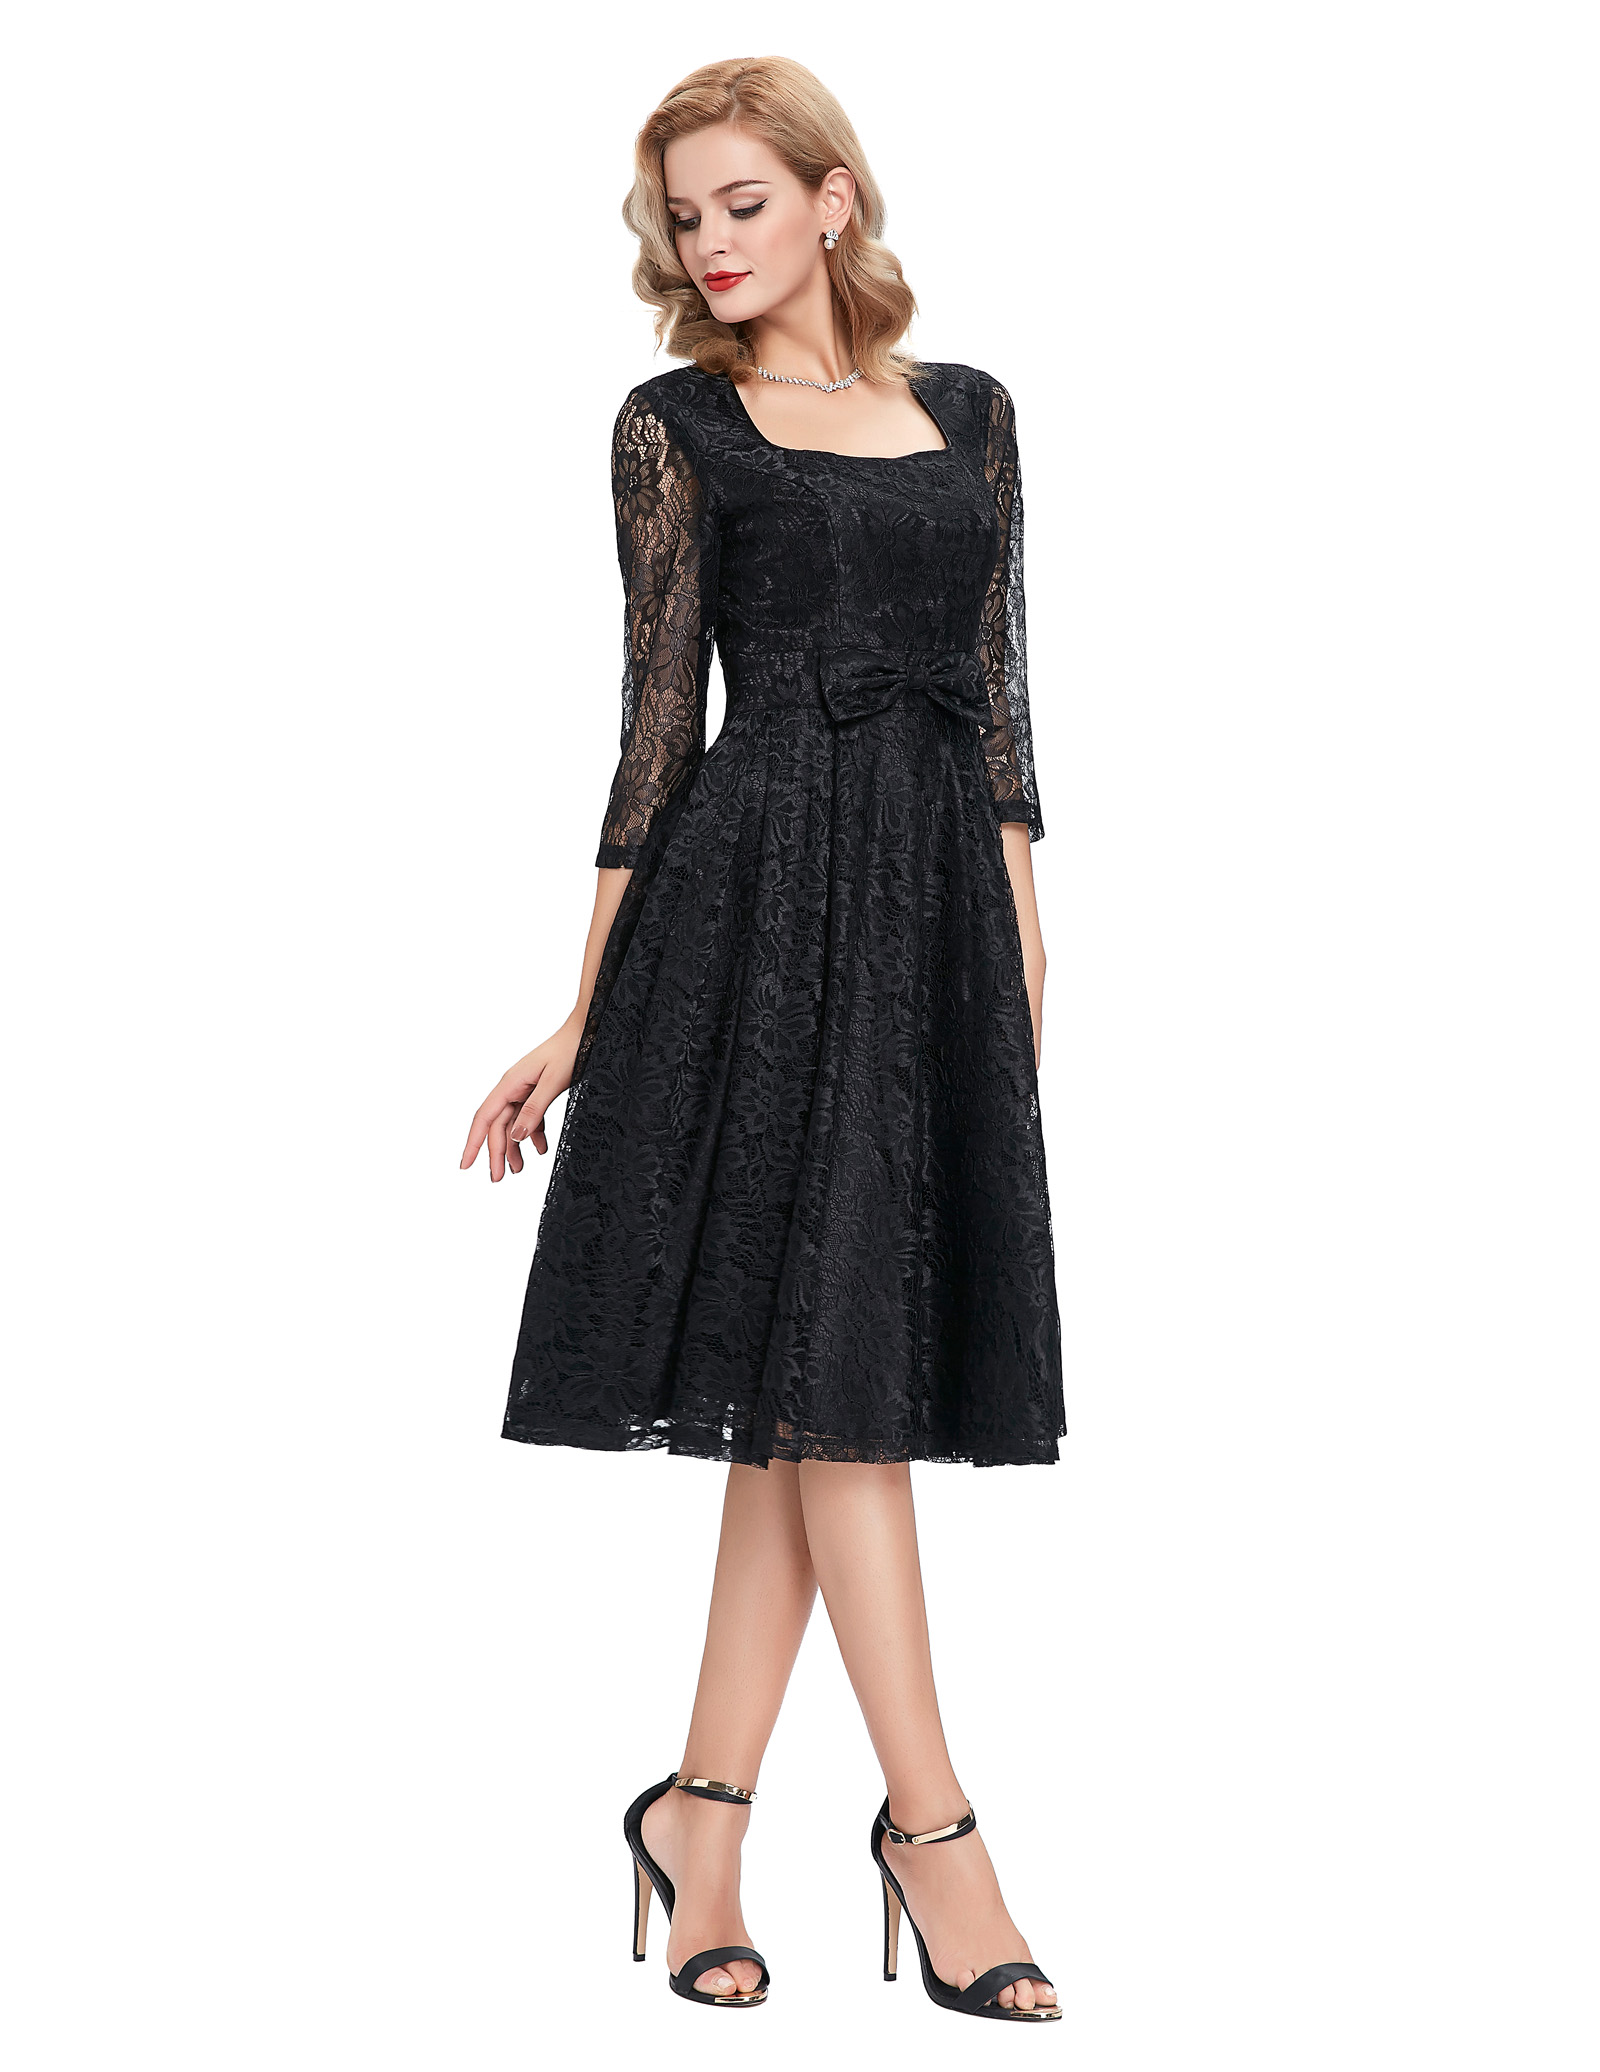 Rockabilly Summer dress women Vintage square Neck Slim Sexy Pin up Rockabilly Vestidos Party Black Lace Dresse 2018